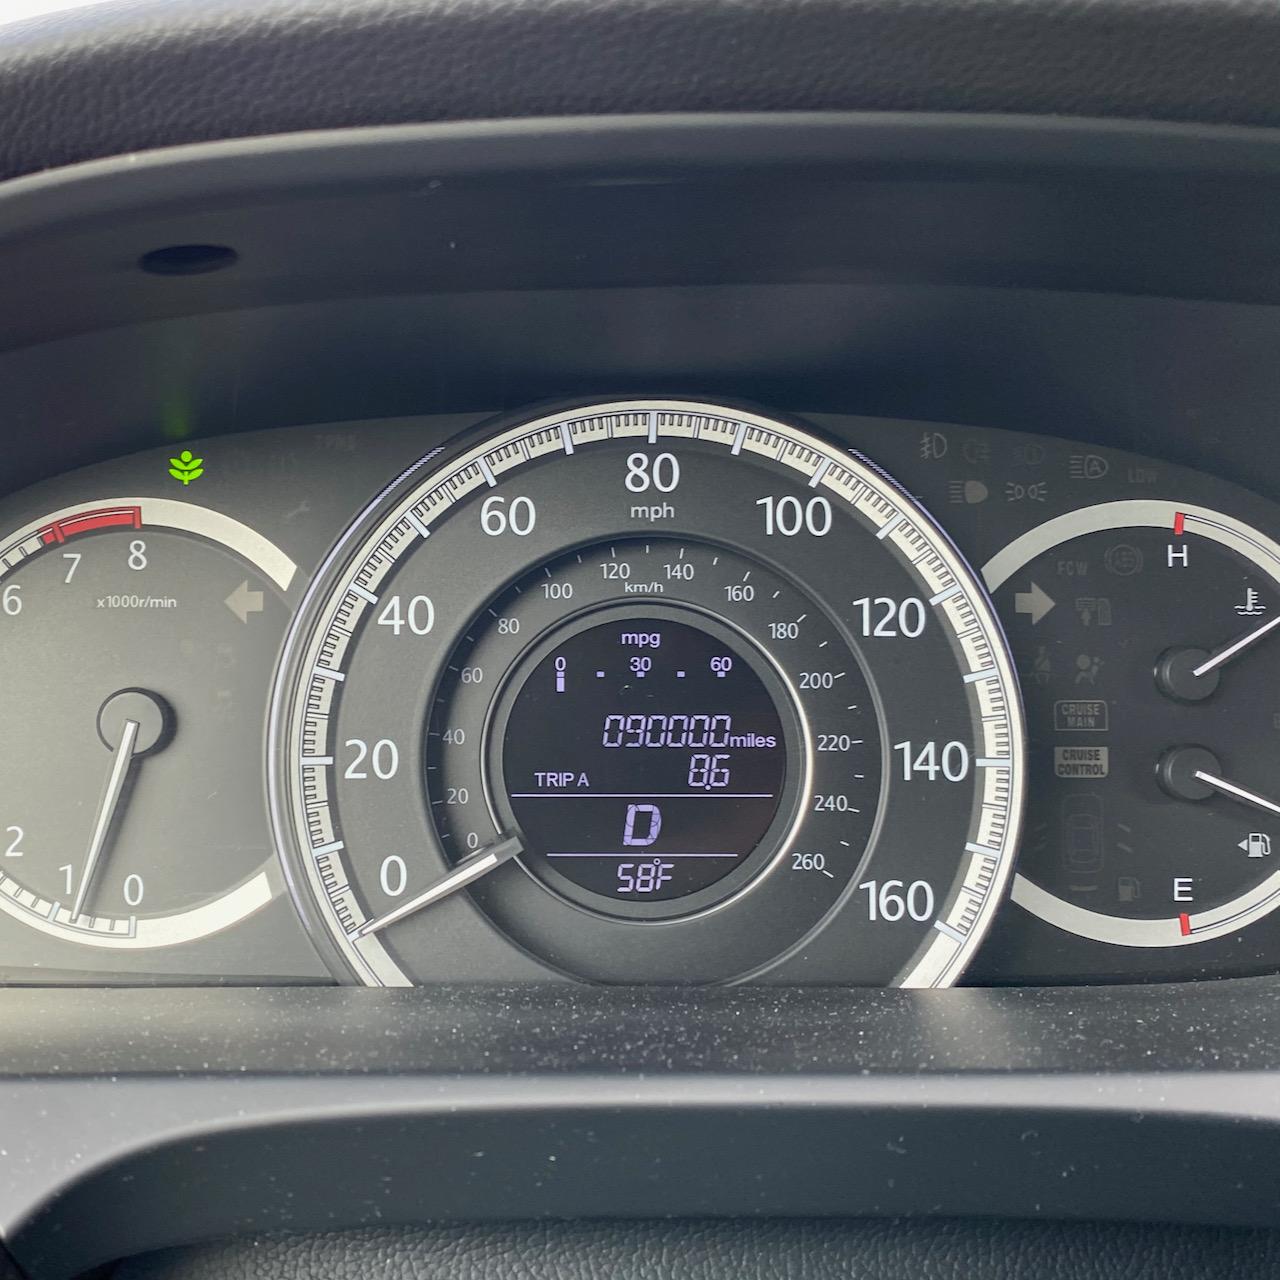 Car odometer reading 90000 miles.